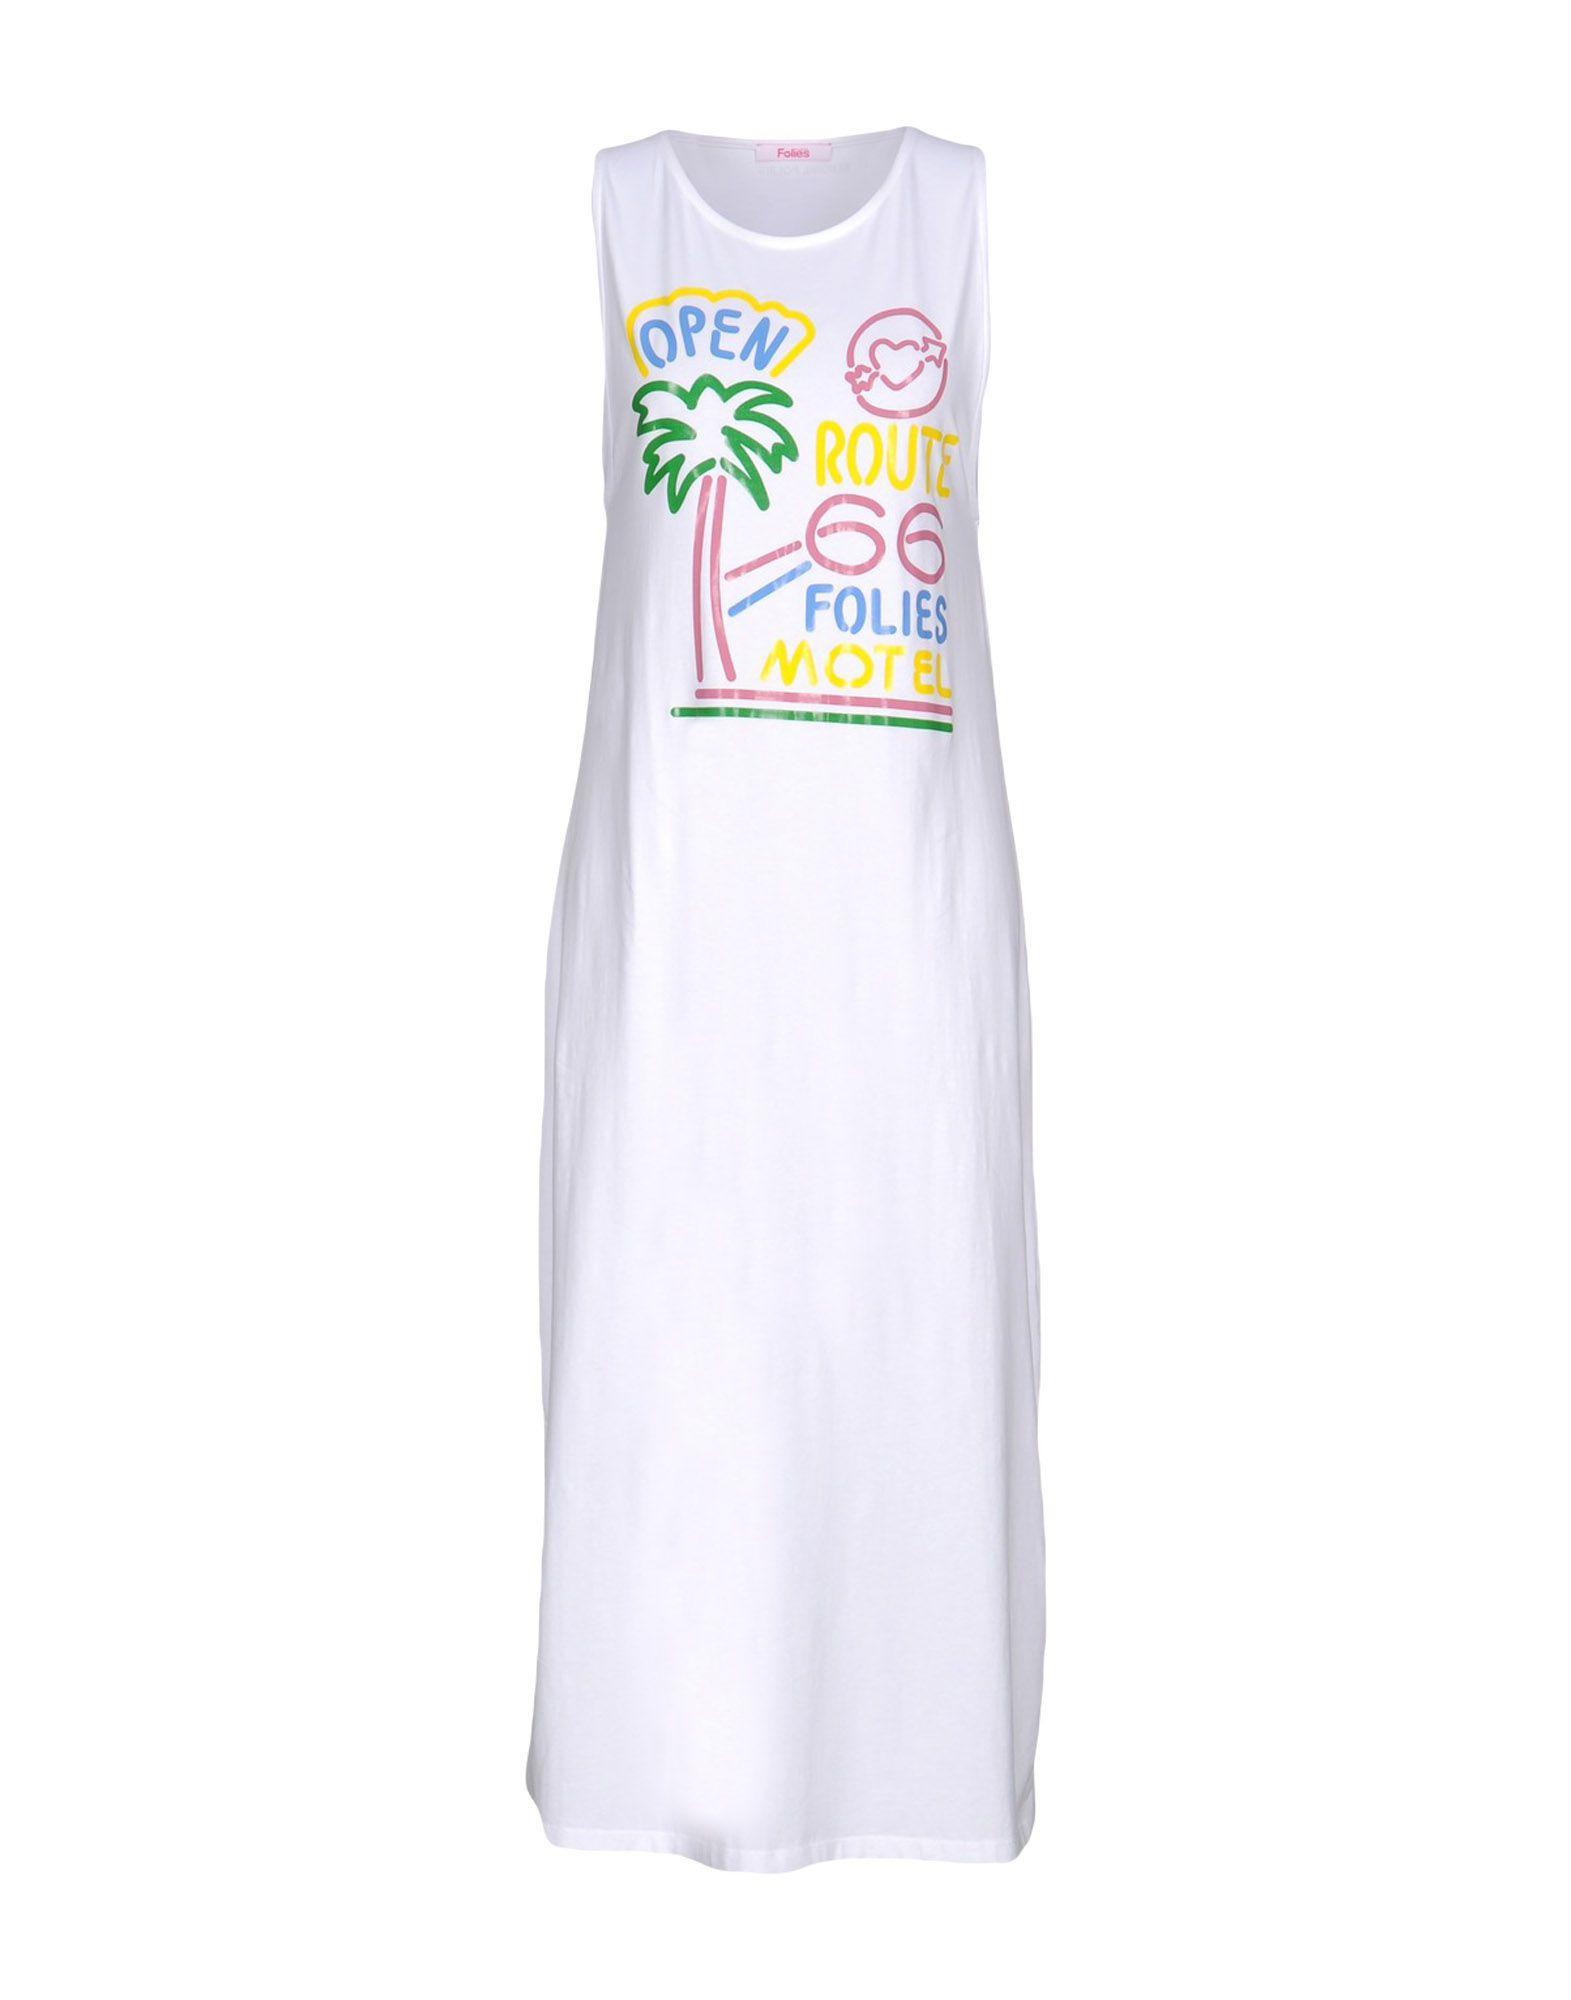 BLUGIRL FOLIES Платье длиной 3/4 фигурки neca фигурка heroes of the storm 7 scale action figure series 2 tyrael